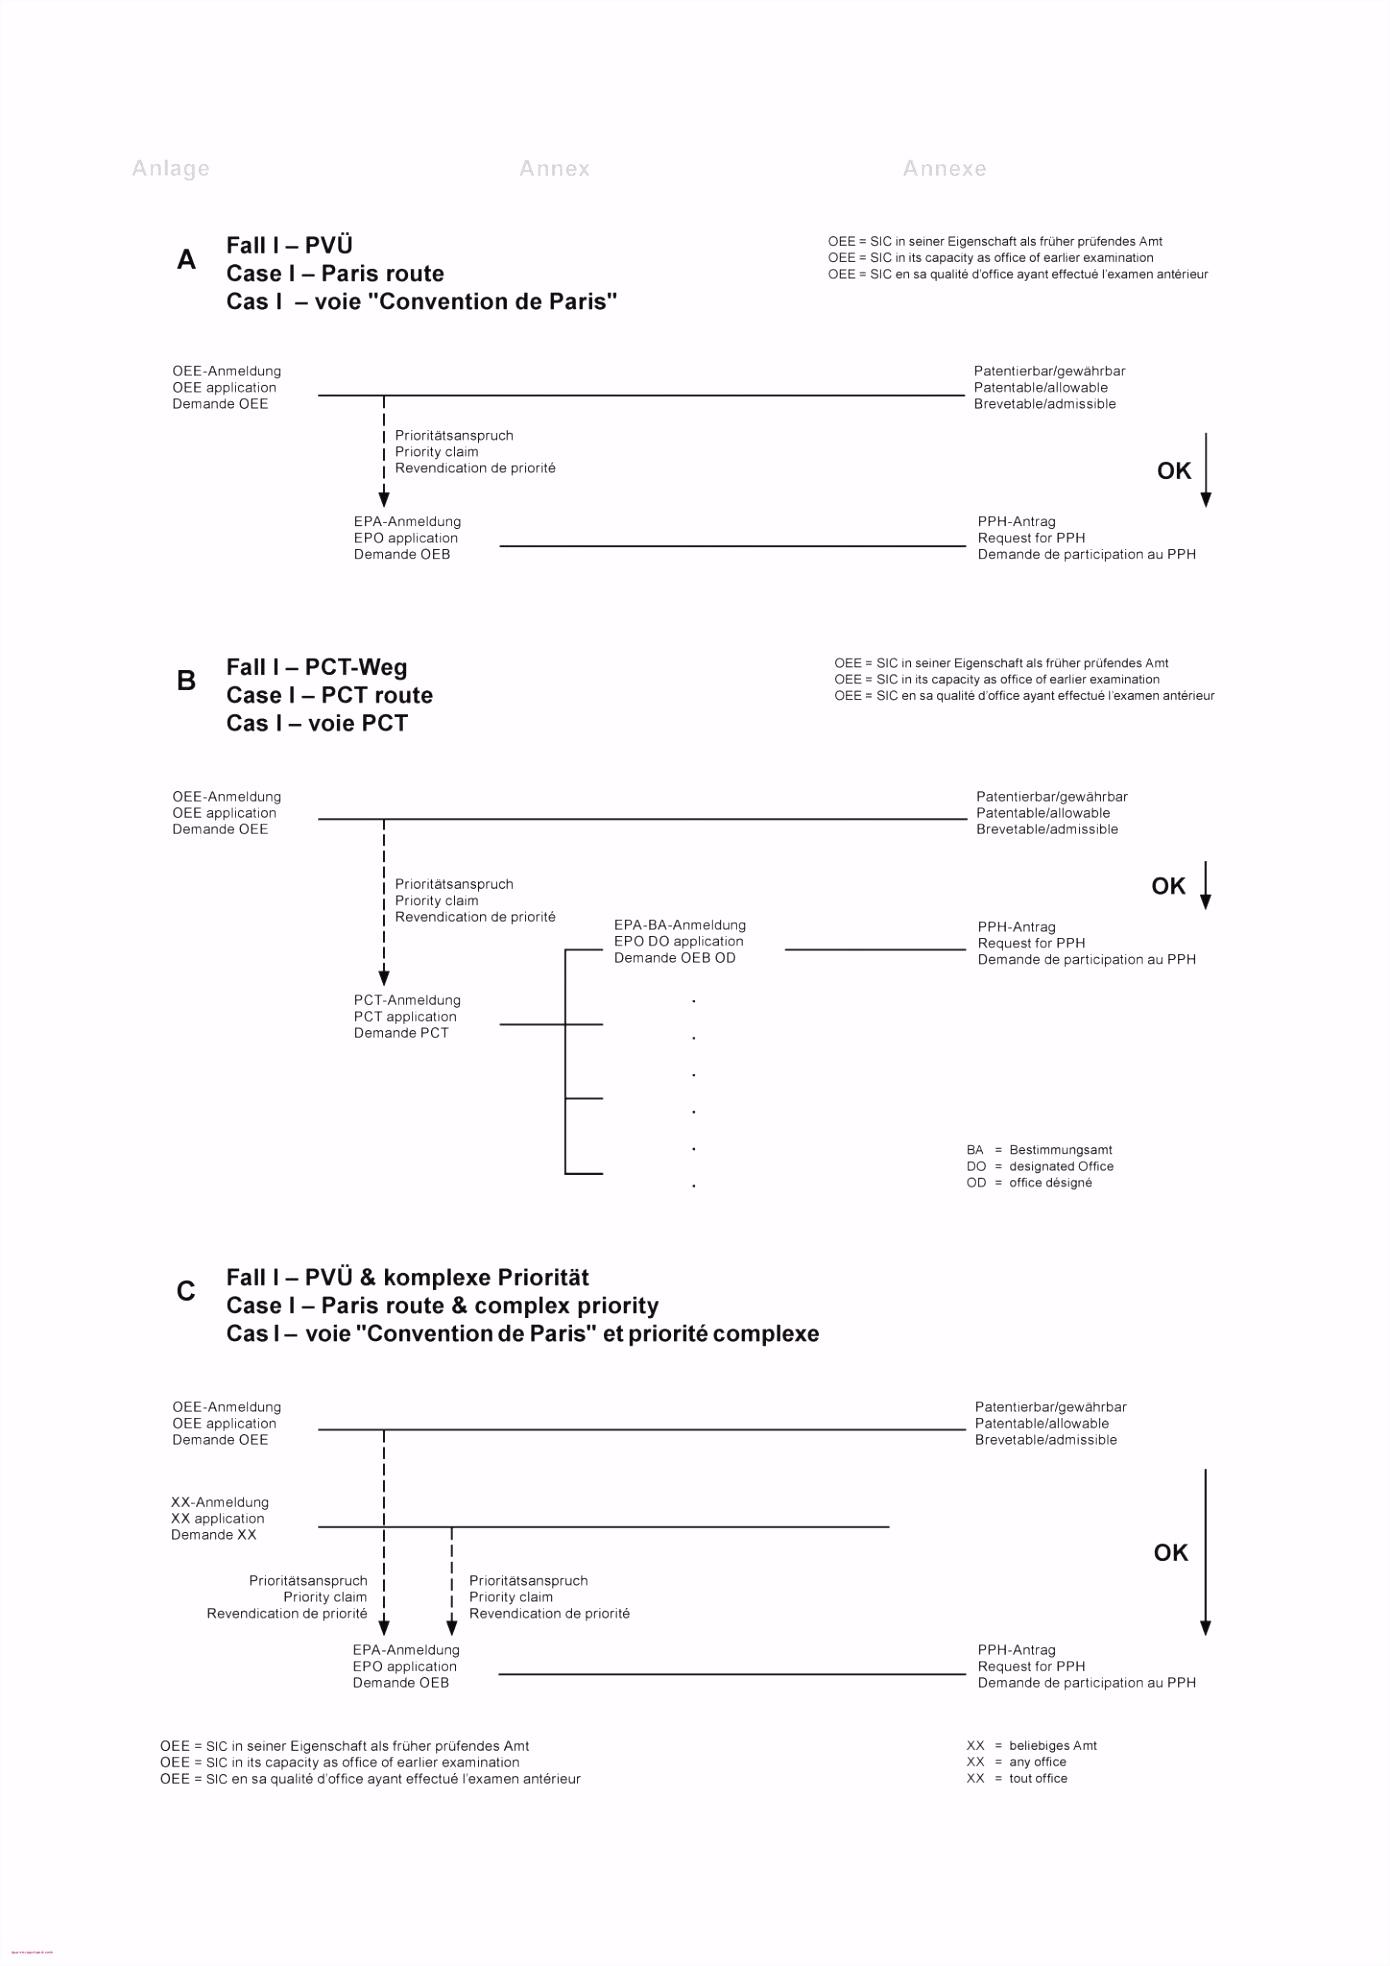 Aufgabenliste Excel Vorlage Product Parison Template Excel Heritage Spreadsheet R5zz76efk0 ispjh5i5b2